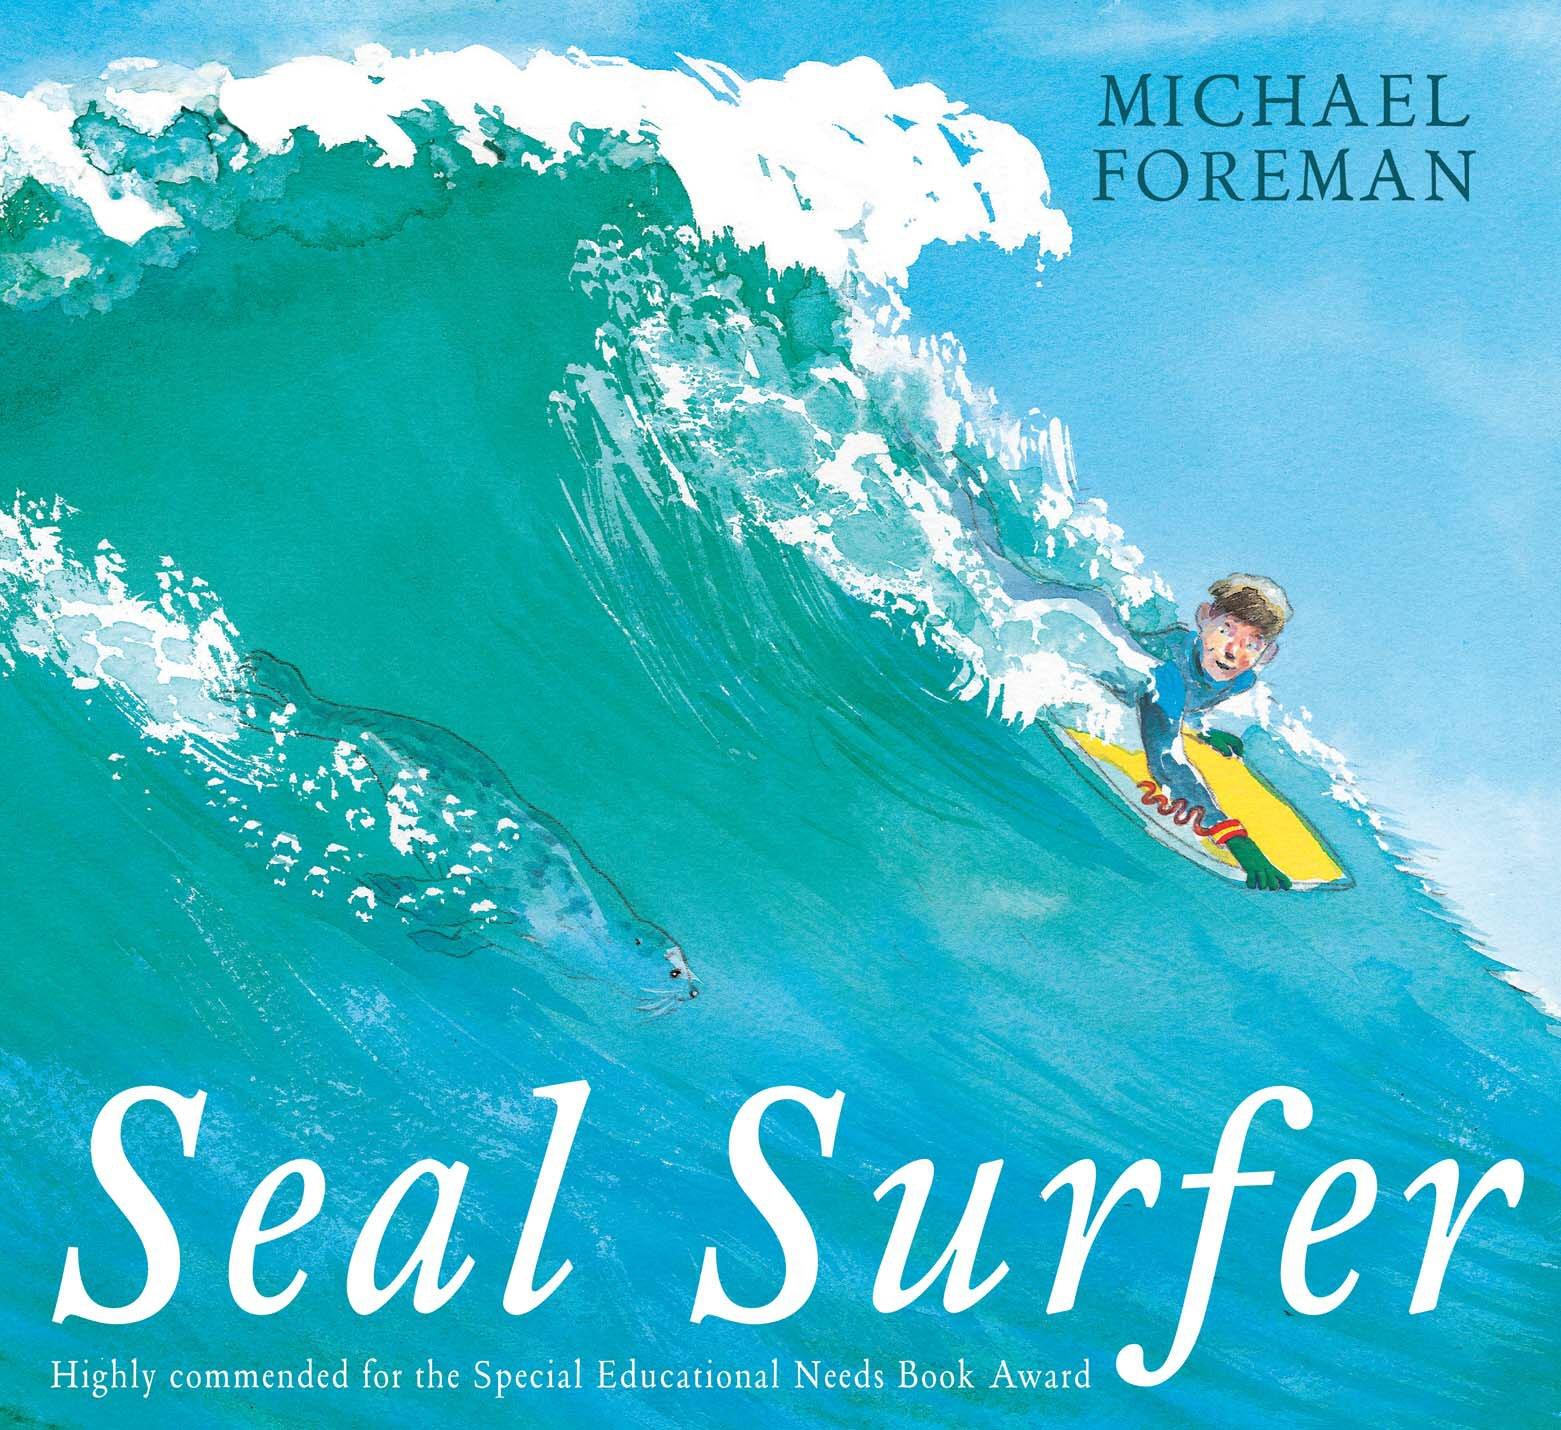 Seal Surfer: Amazon.co.uk: Foreman, Michael: Books